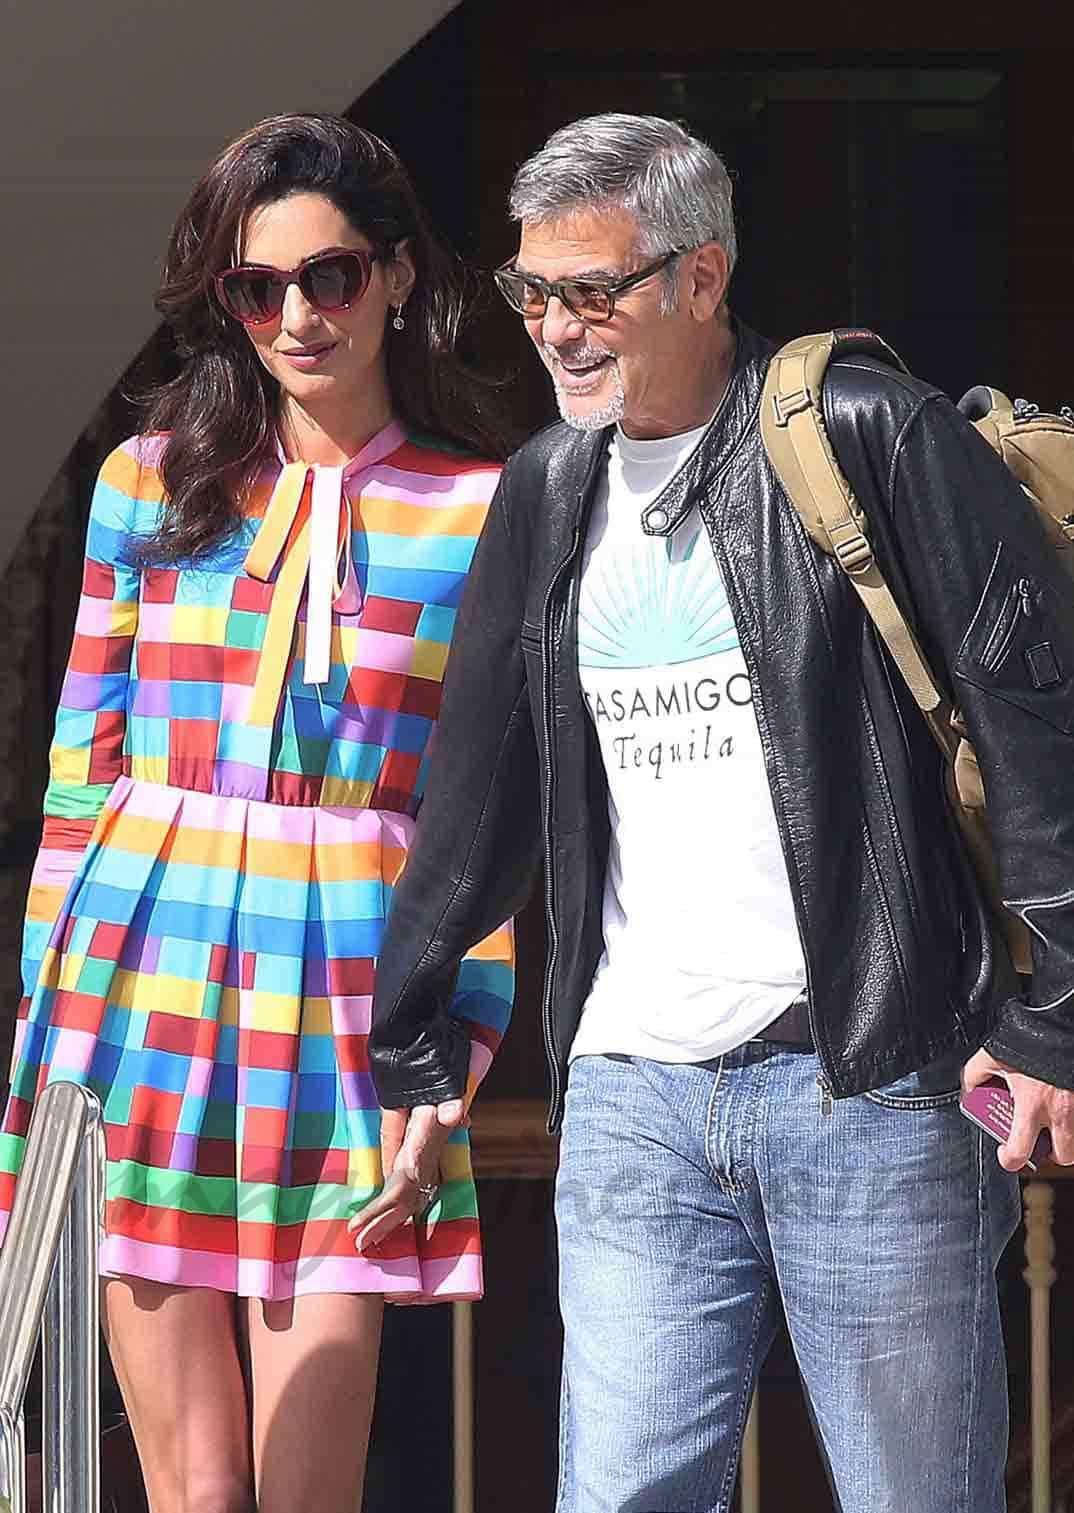 Matrimonio In Libano : George clooney y amal alamuddin boda por contrato